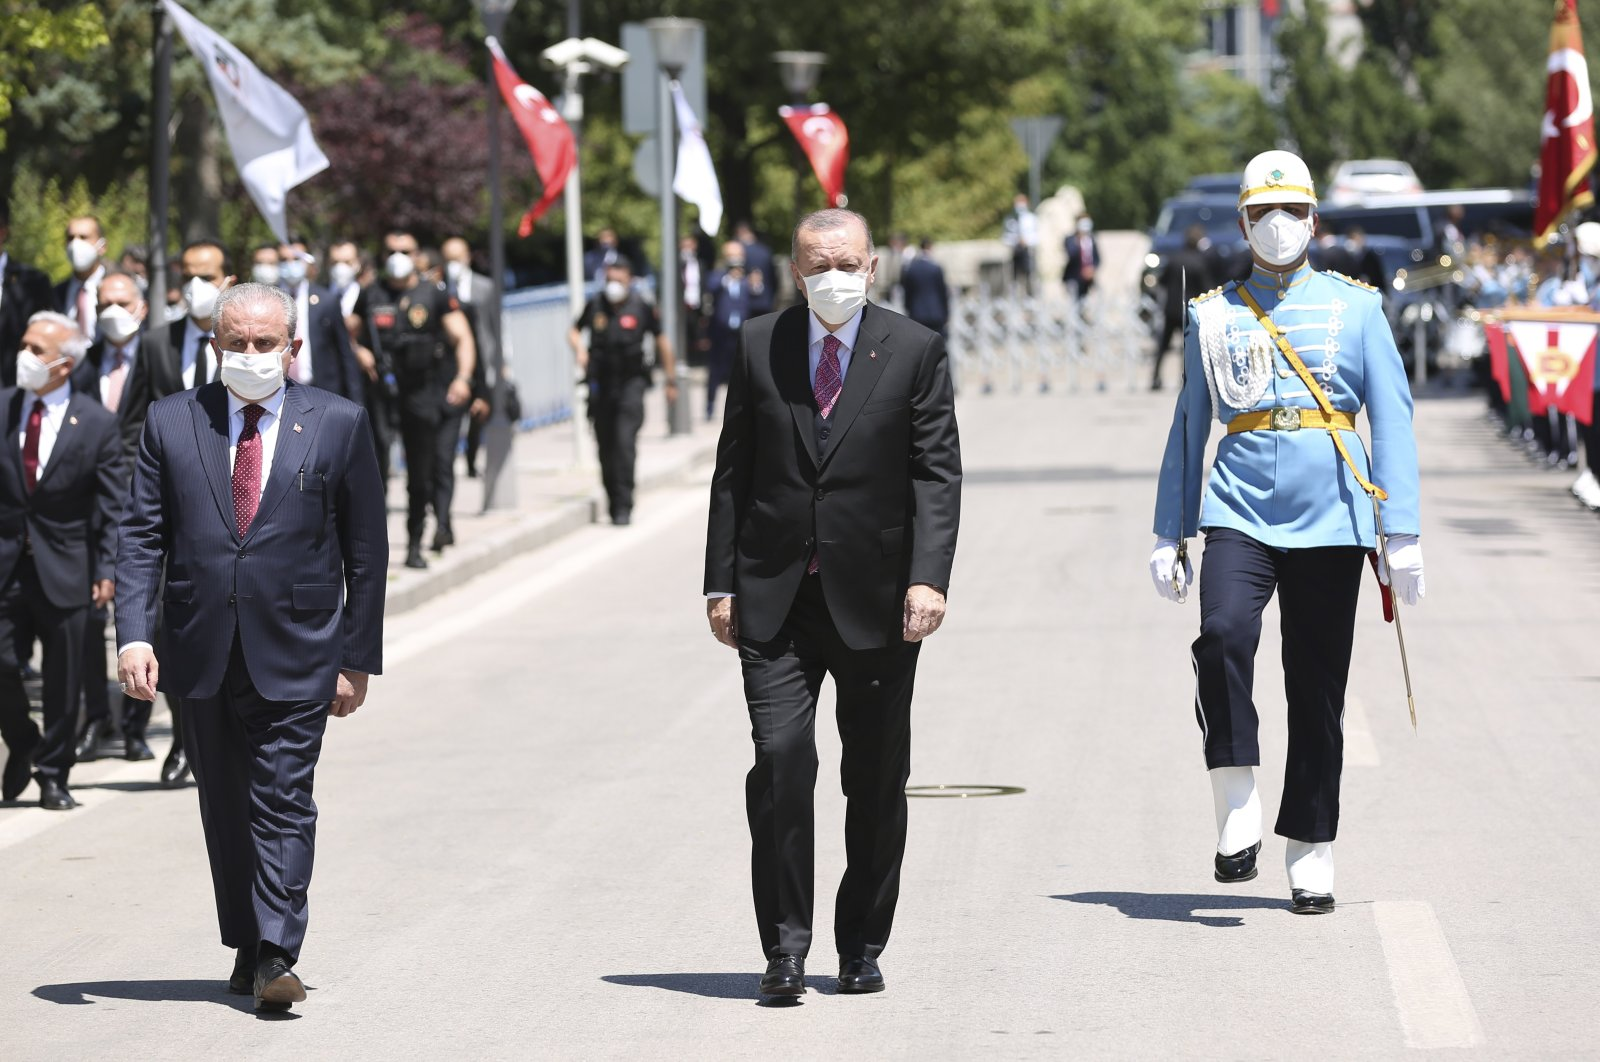 President Recep Tayyip Erdoğan, Turkish Parliament Speaker Mustafa Şentop walk toward the commemoration ceremony held in the capital Ankara, Turkey, July 15, 2021. (IHA Photo)